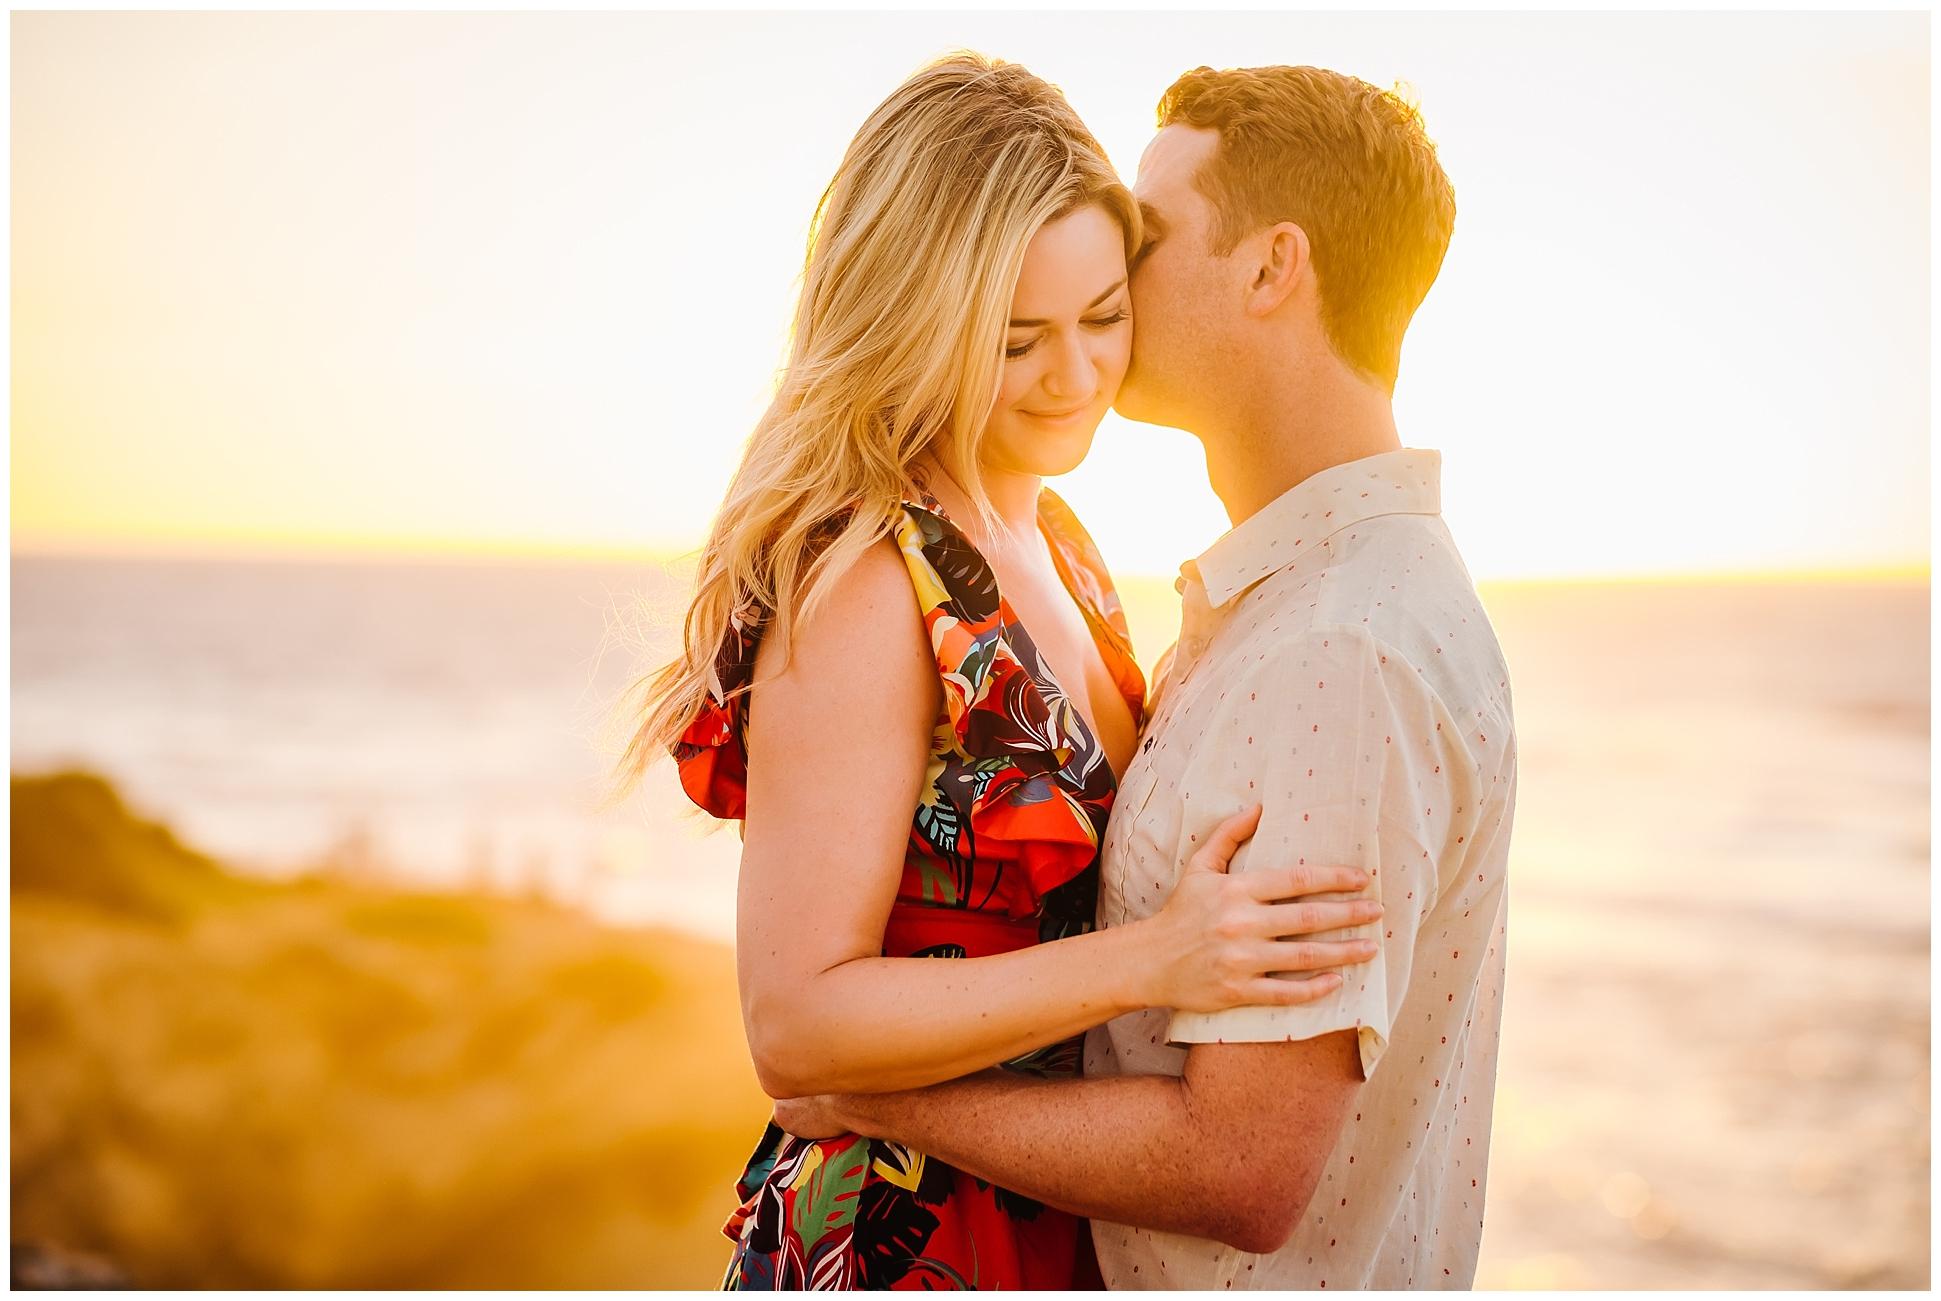 hawaiin-honeymoon-sunrise-portraits-kauai-grand-hystt-destination-photographer_0003.jpg